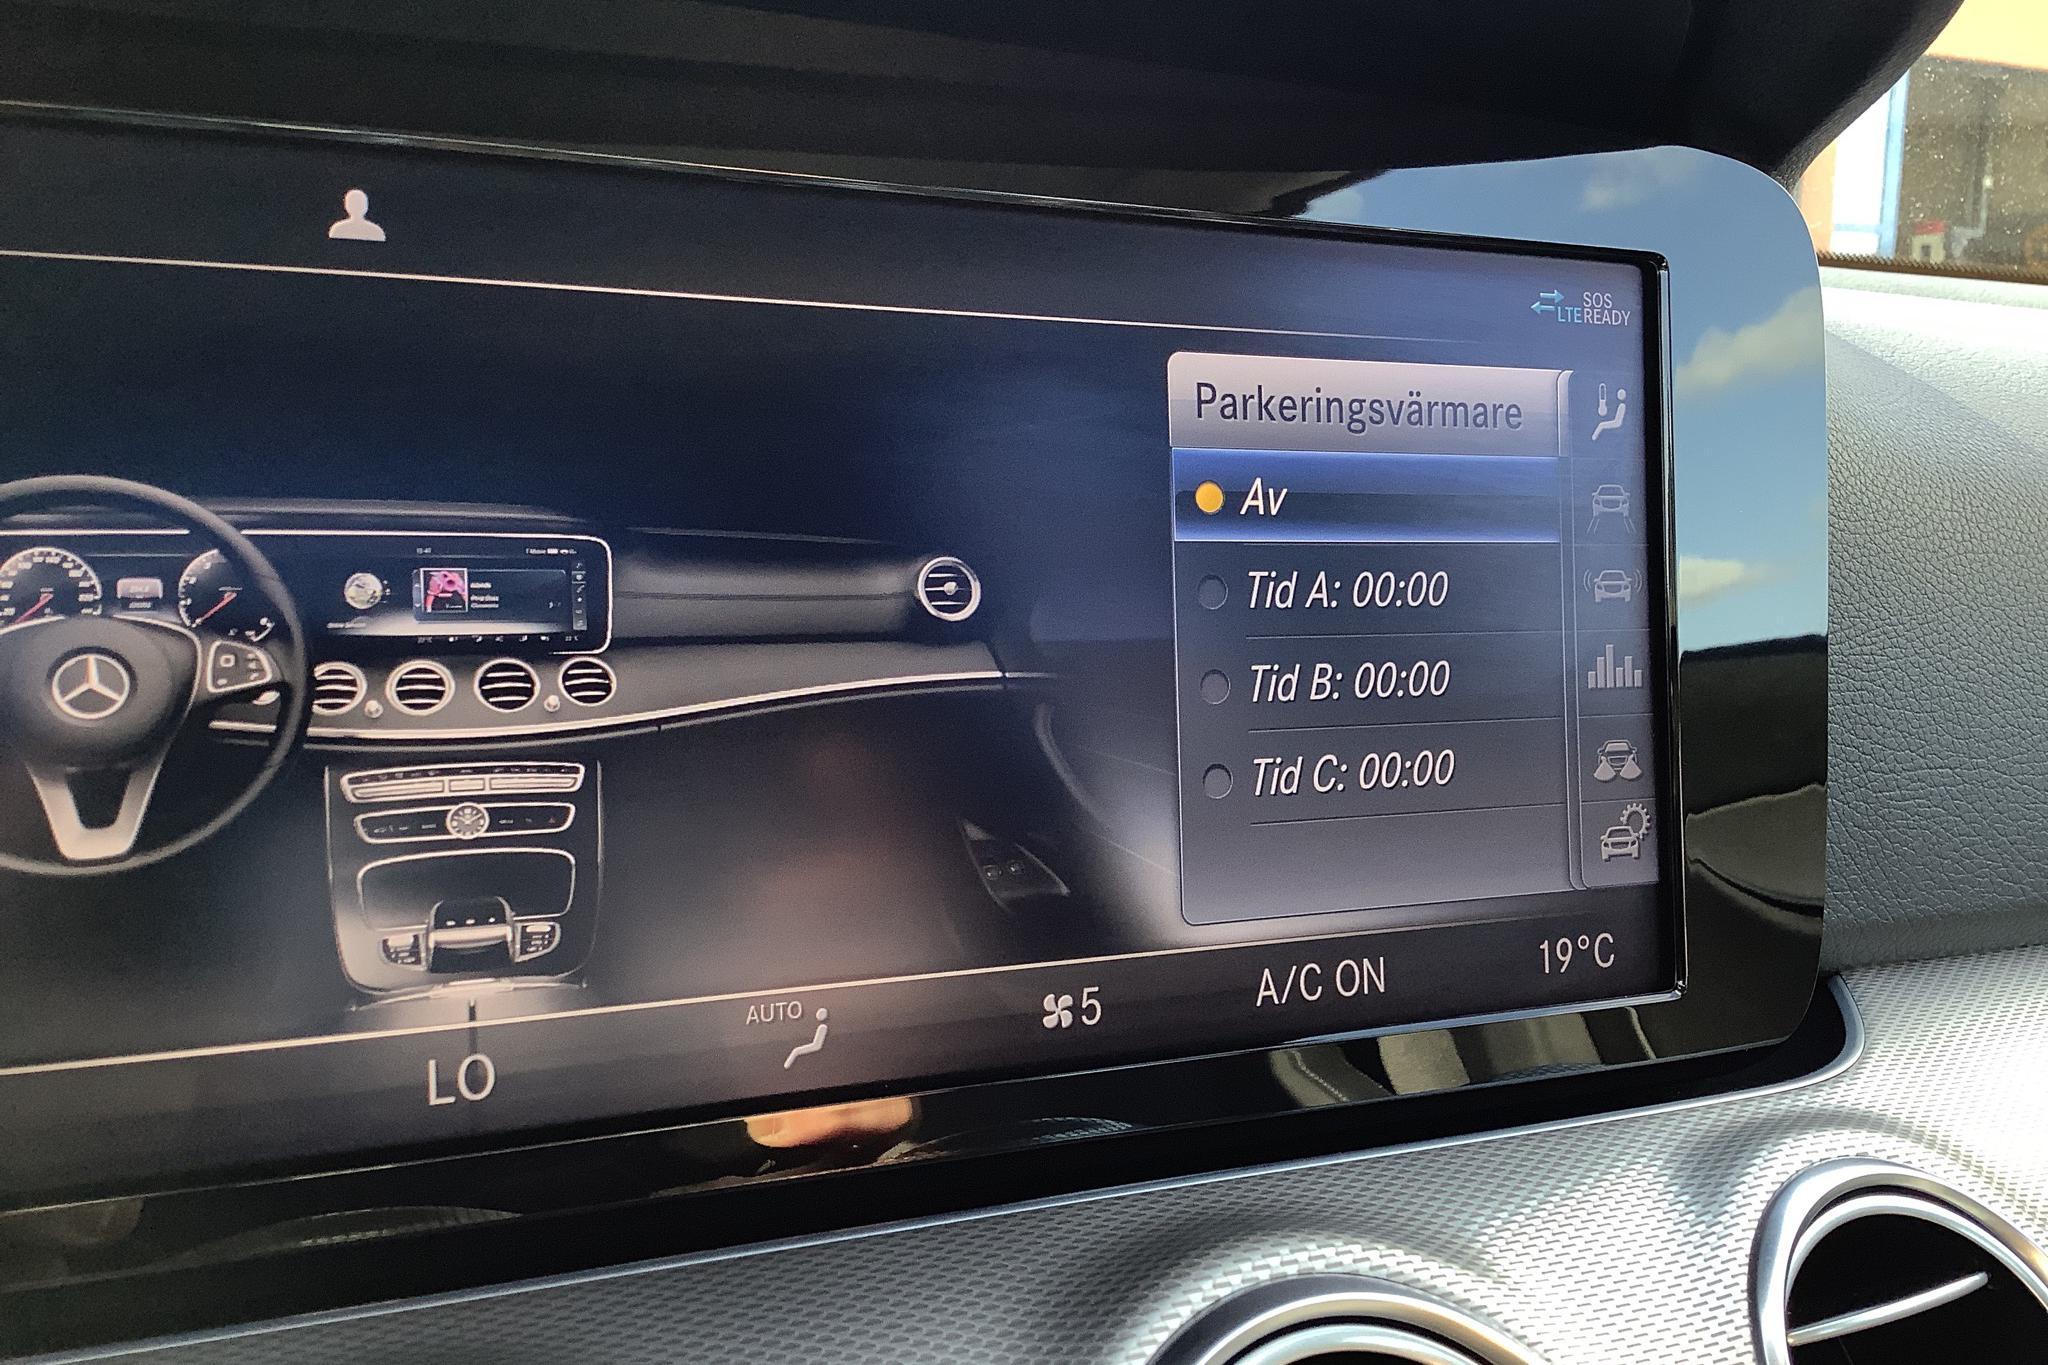 Mercedes E 220 d 4MATIC Sedan W213 (194hk) - 3 418 mil - Automat - grå - 2018